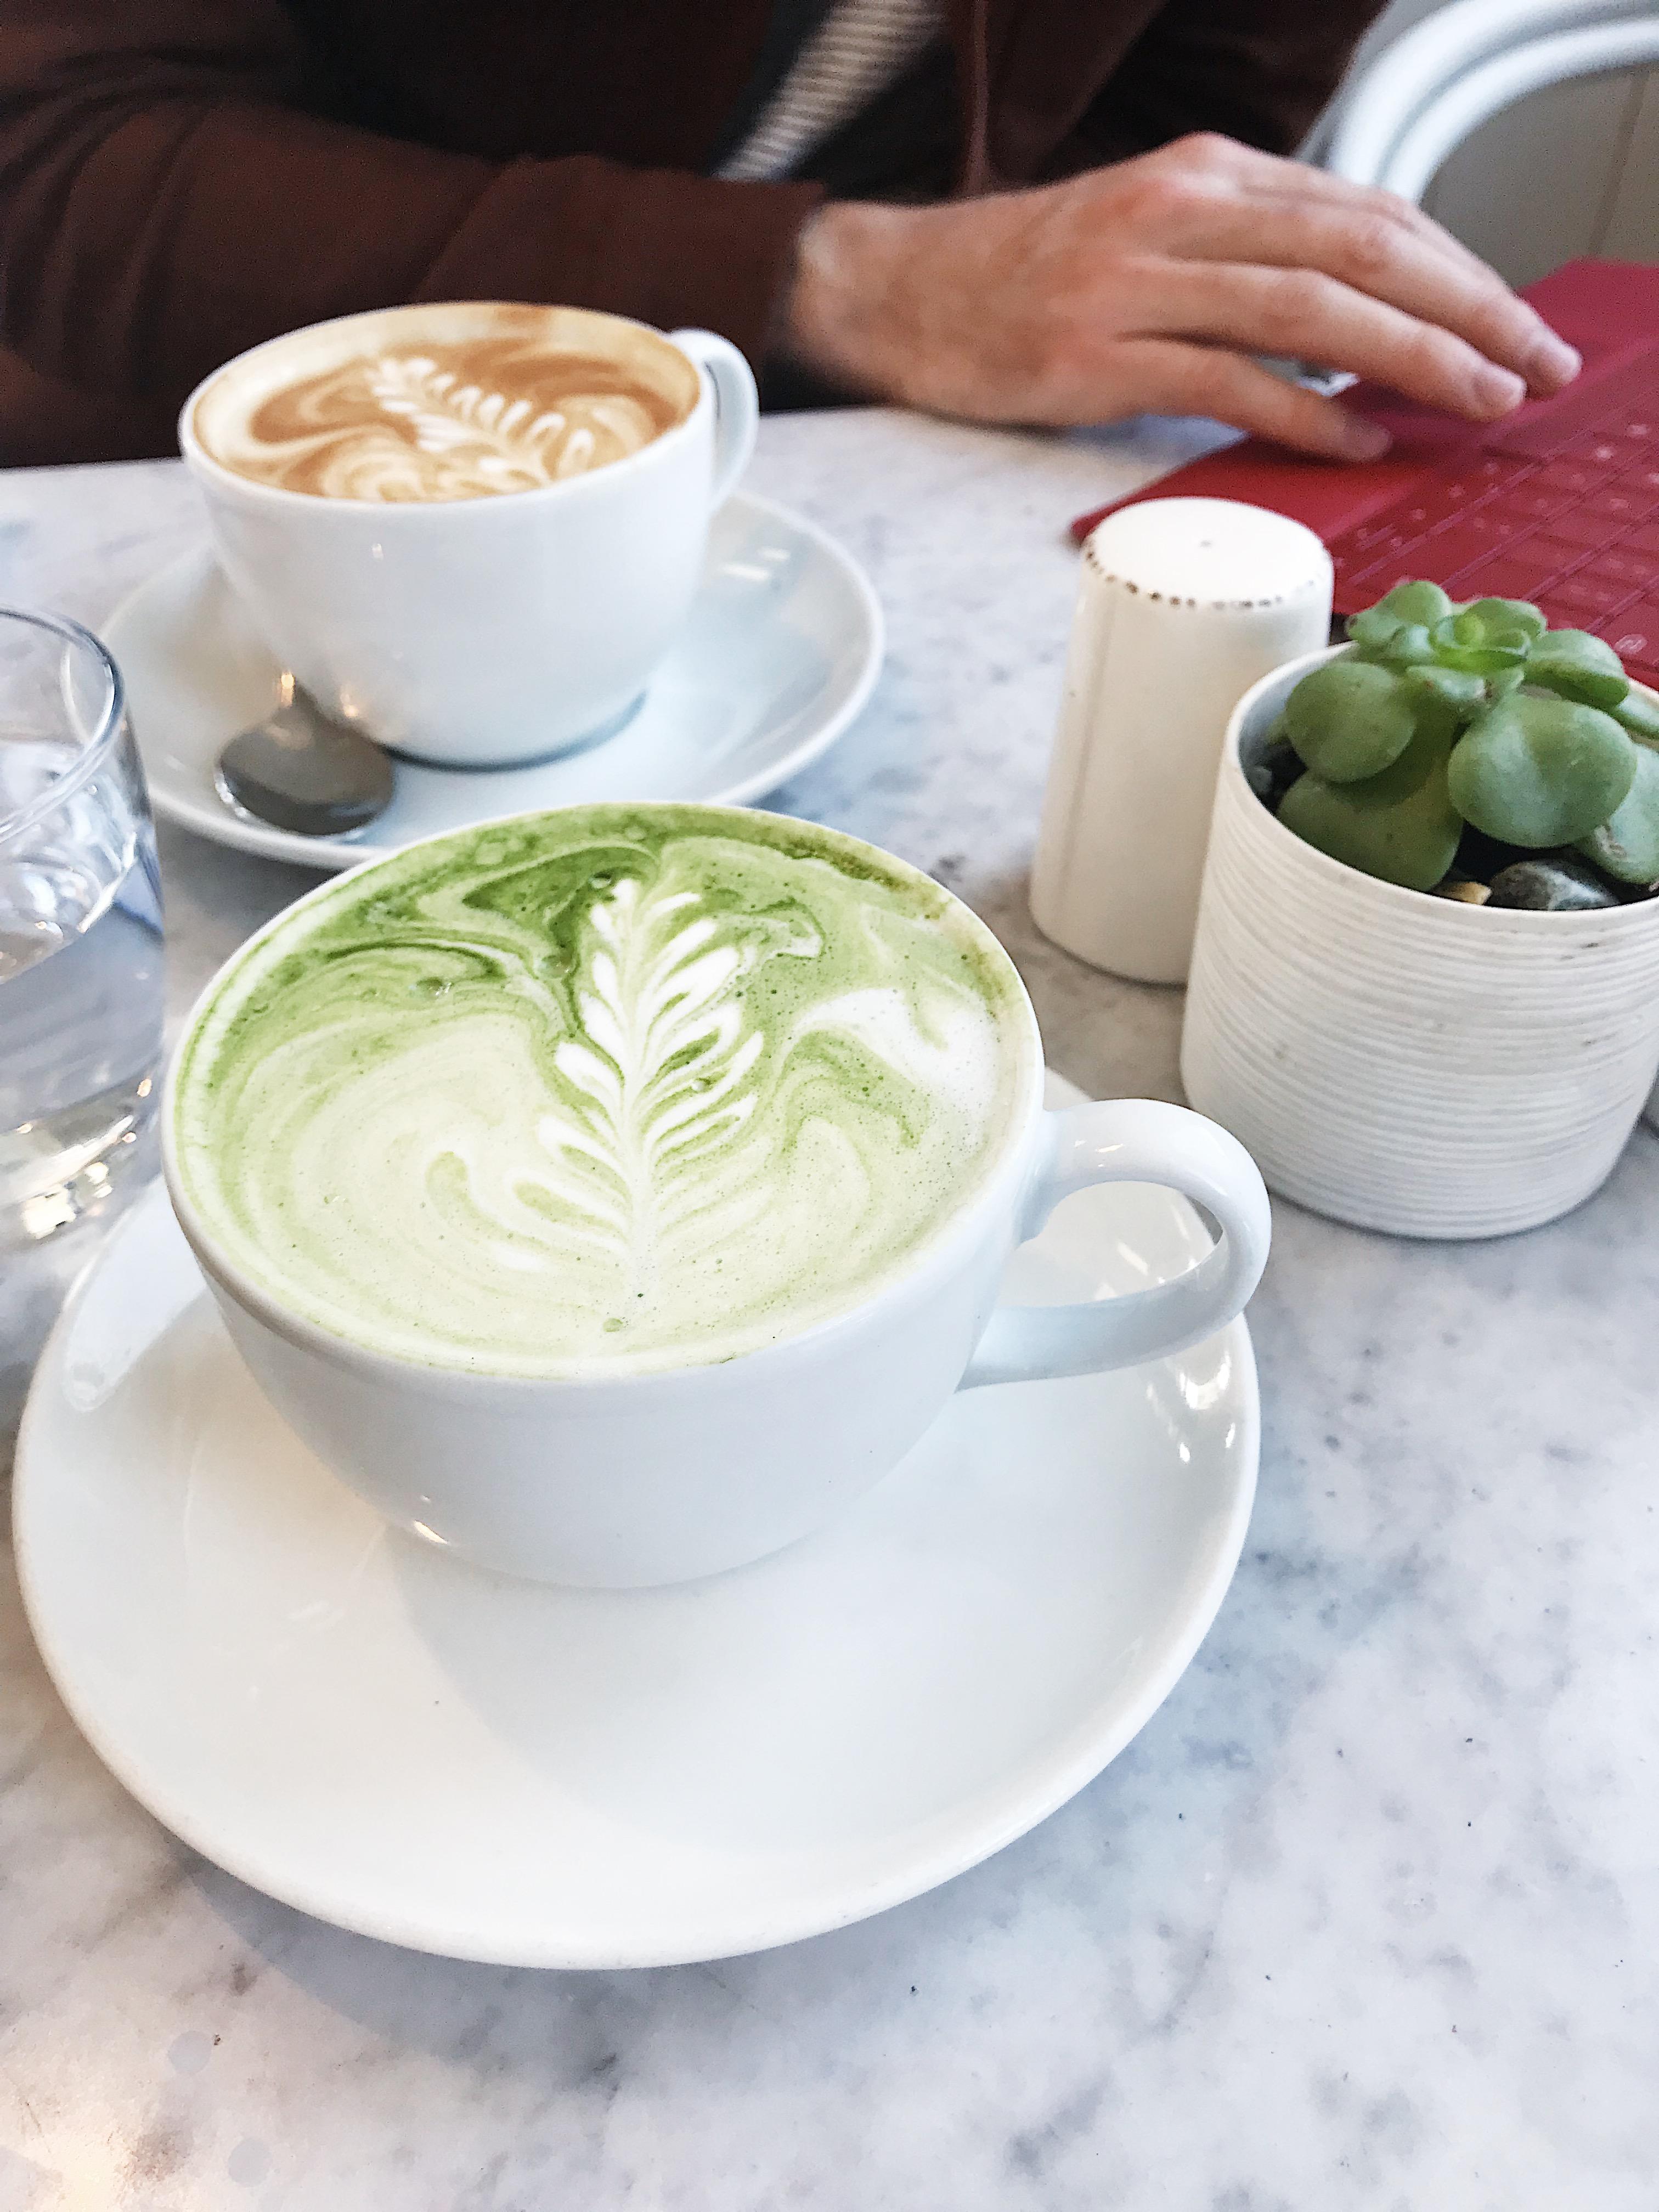 dairy-free latte plant-based food